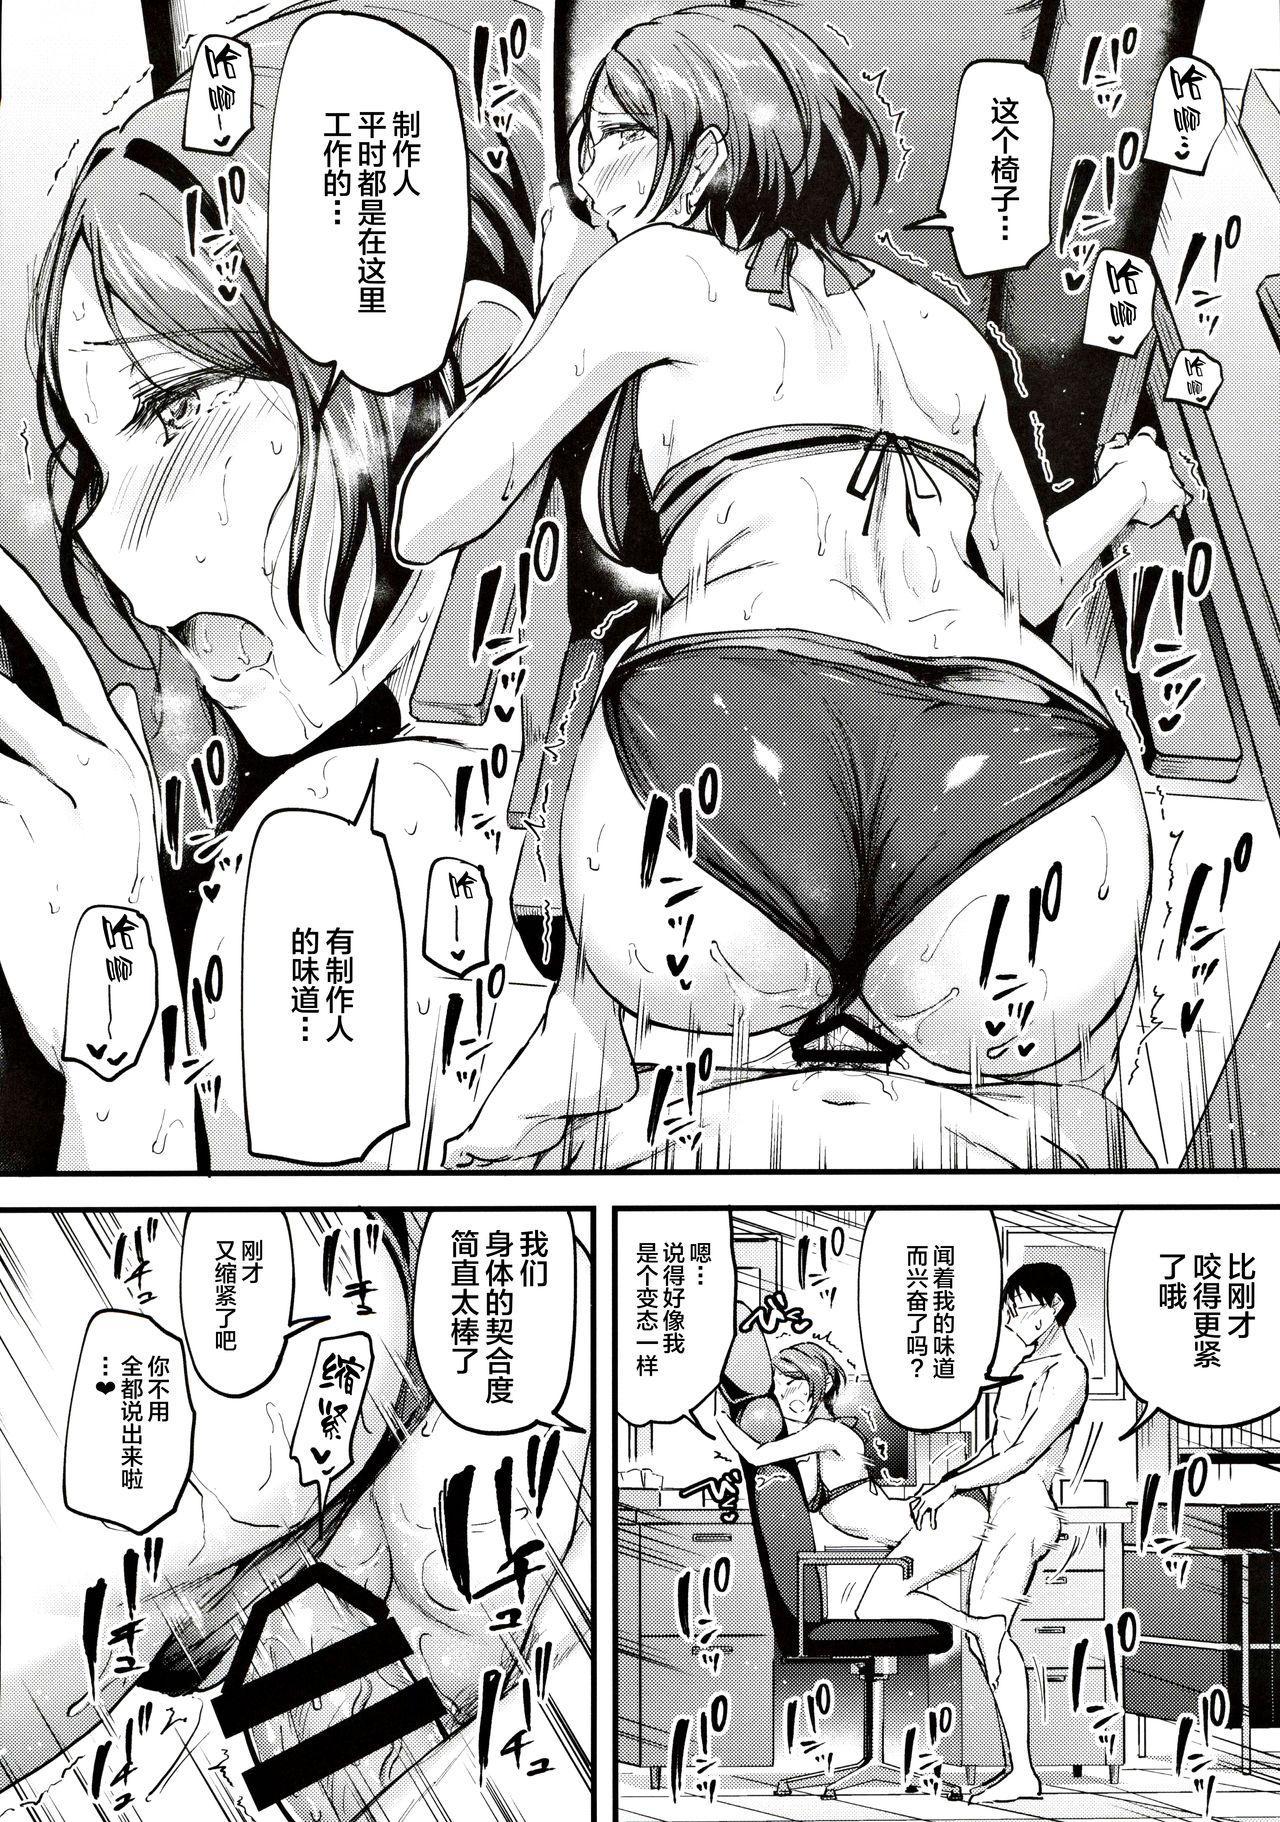 Kanade ga Mizugi ni Kigaetara 22